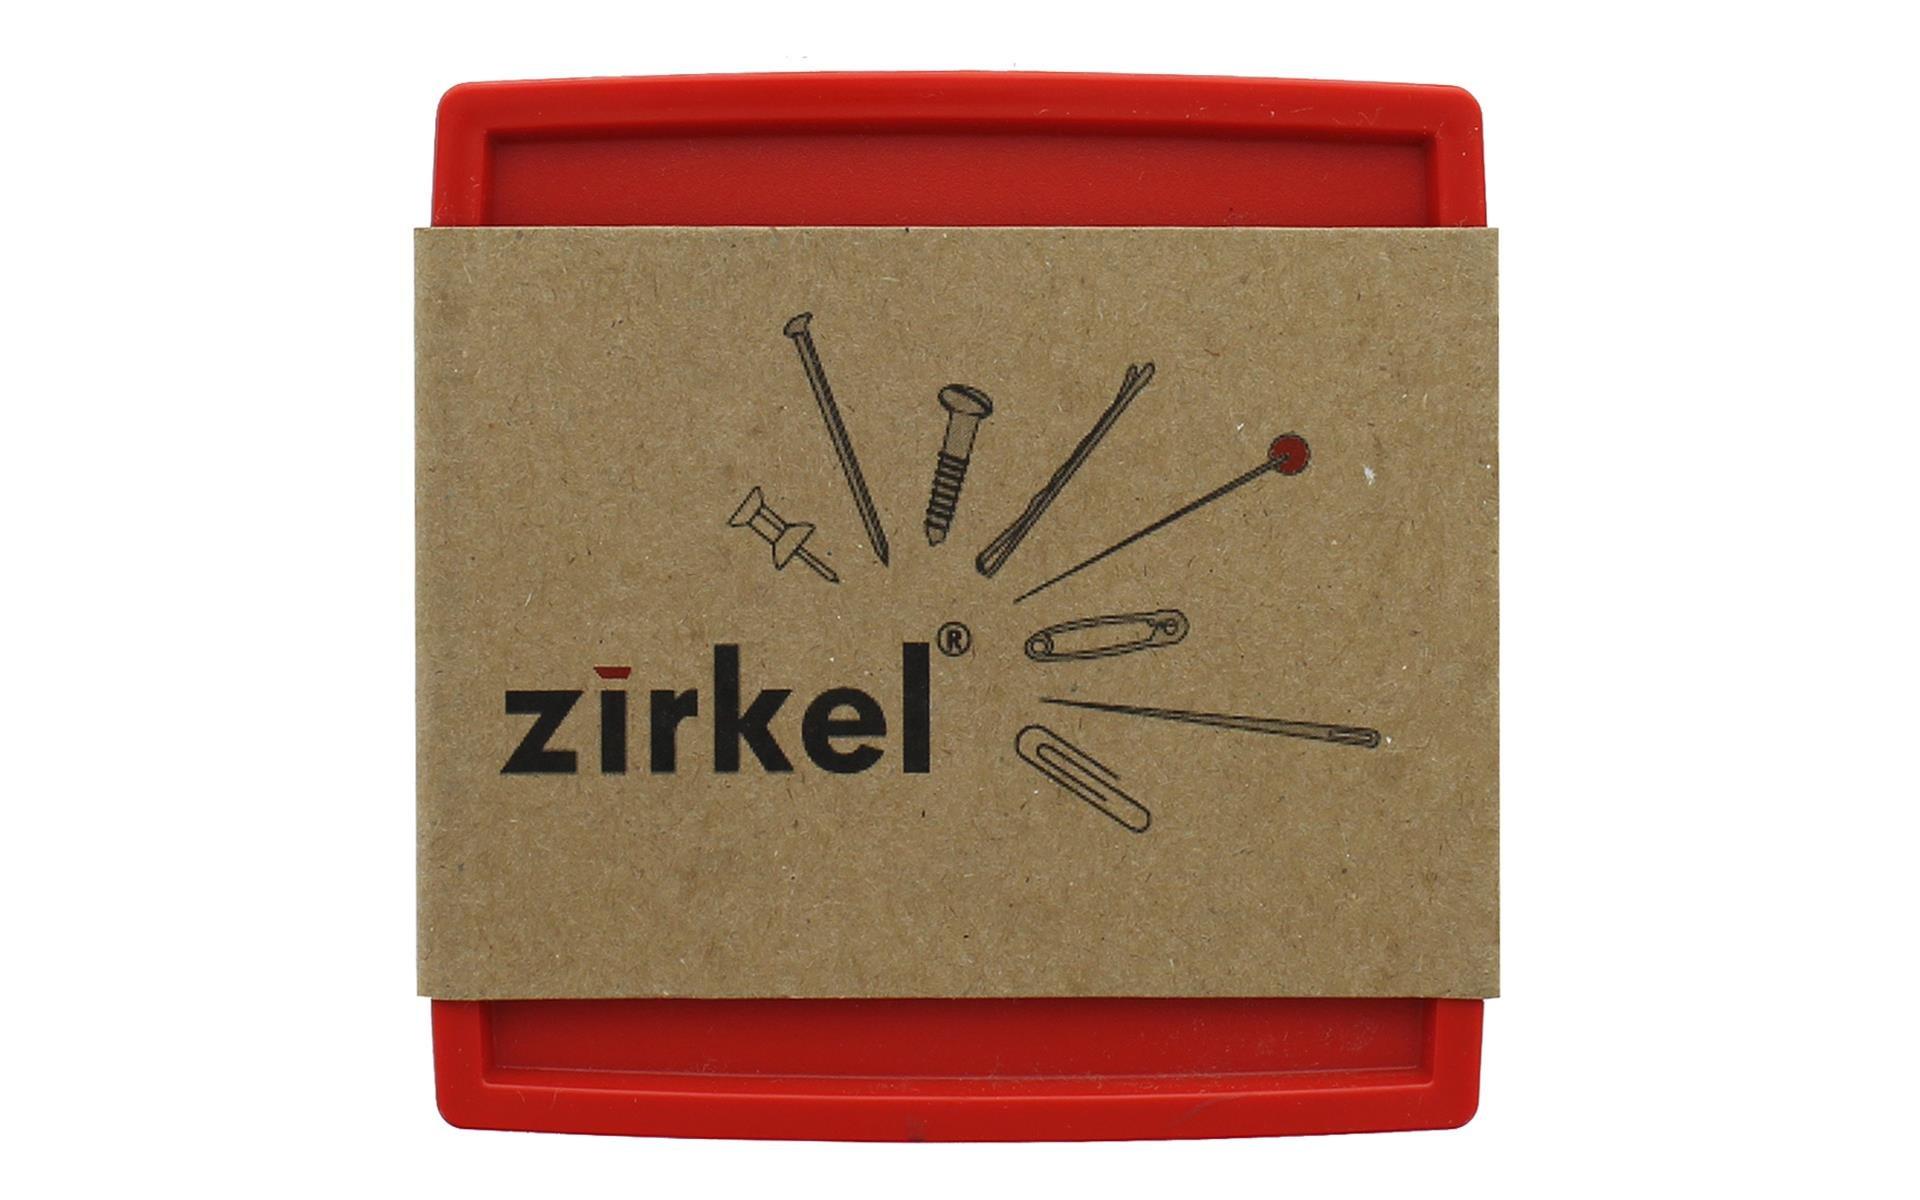 Zirkel Magnetic Pin Holder Red